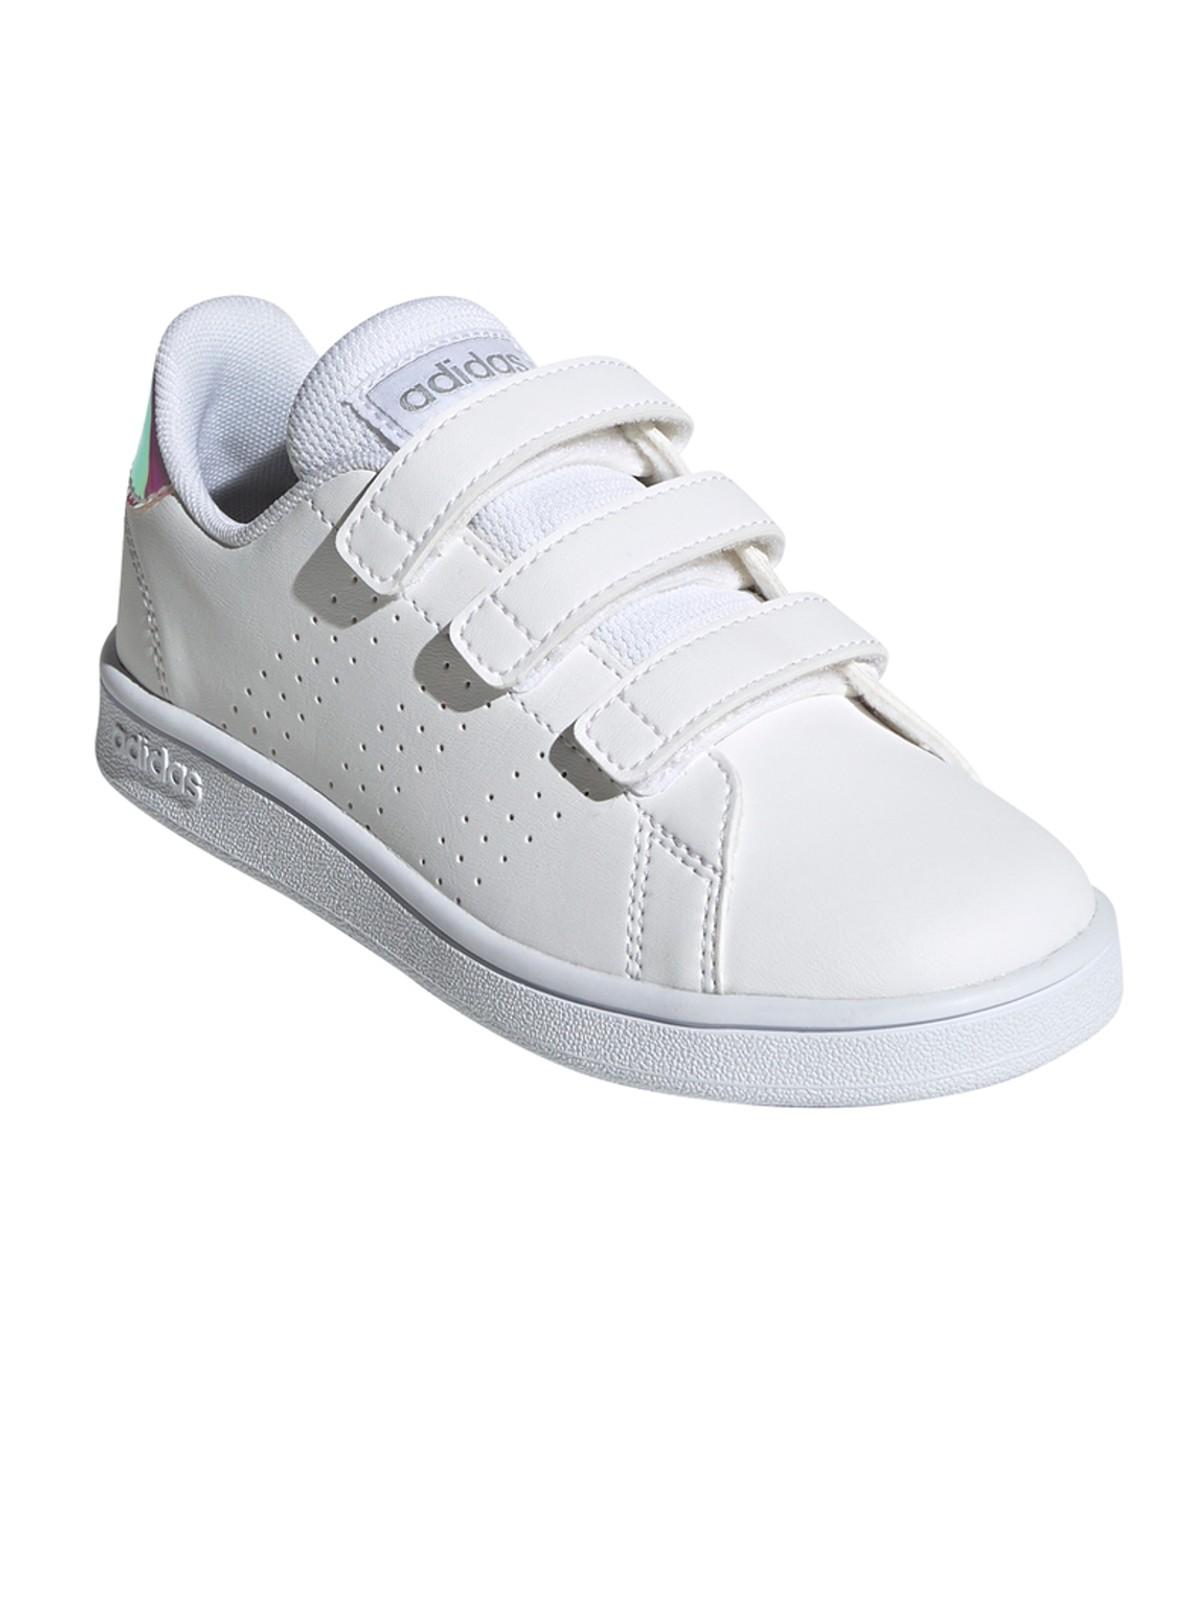 Baskets adidas blanches fille (28-35) - DistriCenter